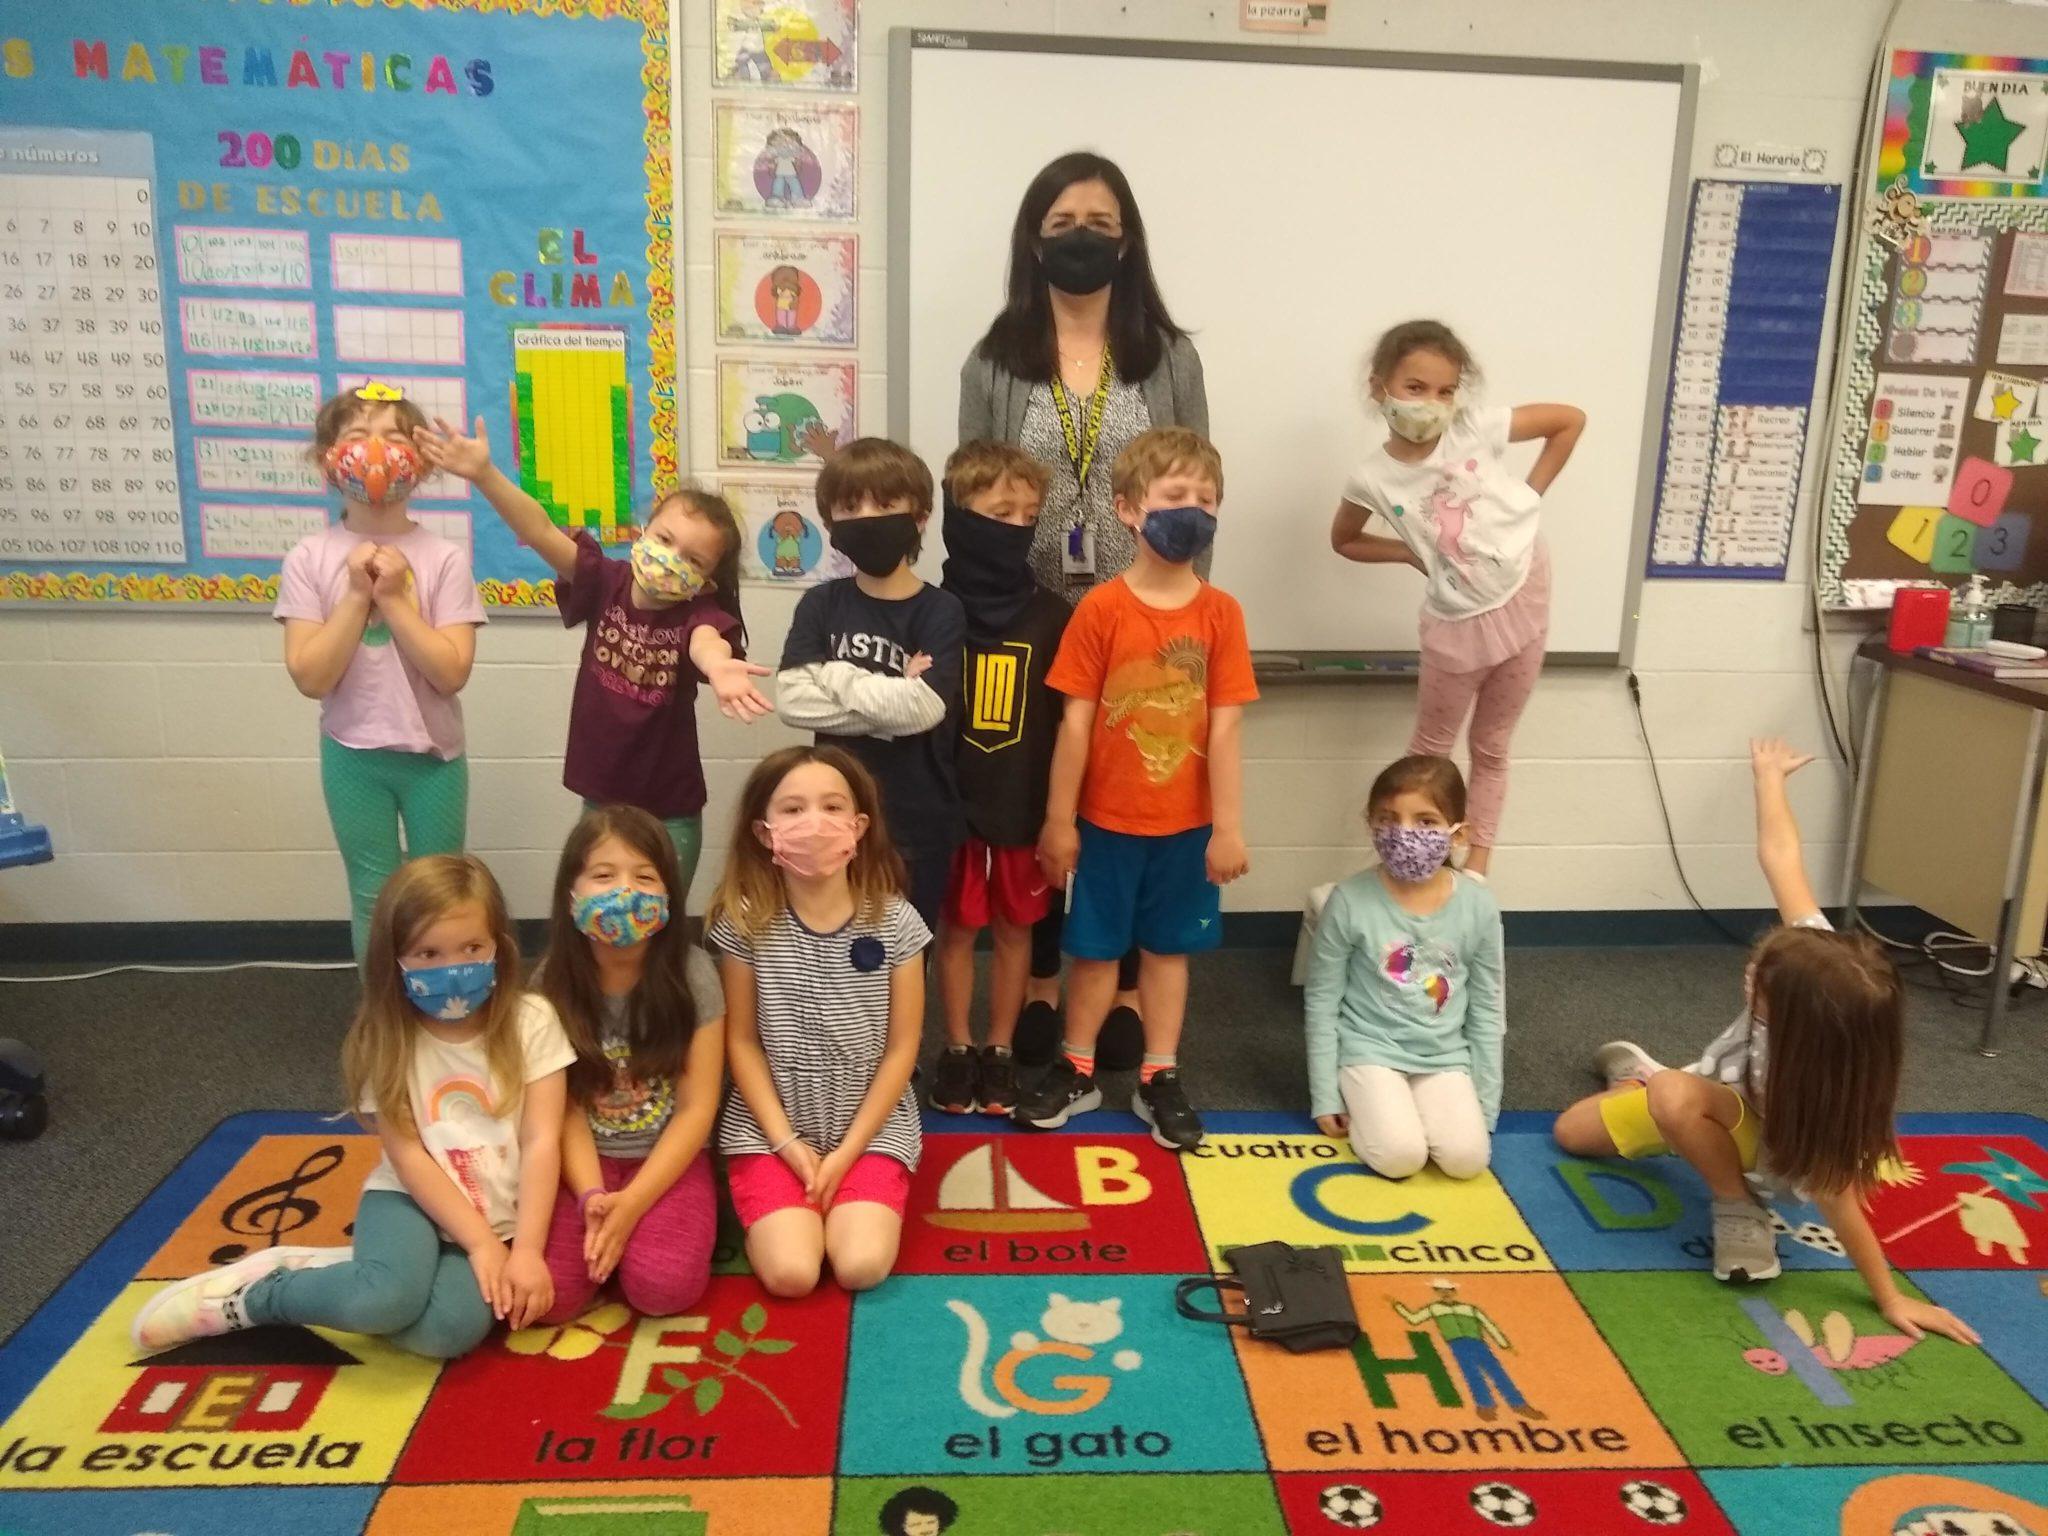 xiema campos classroom with students